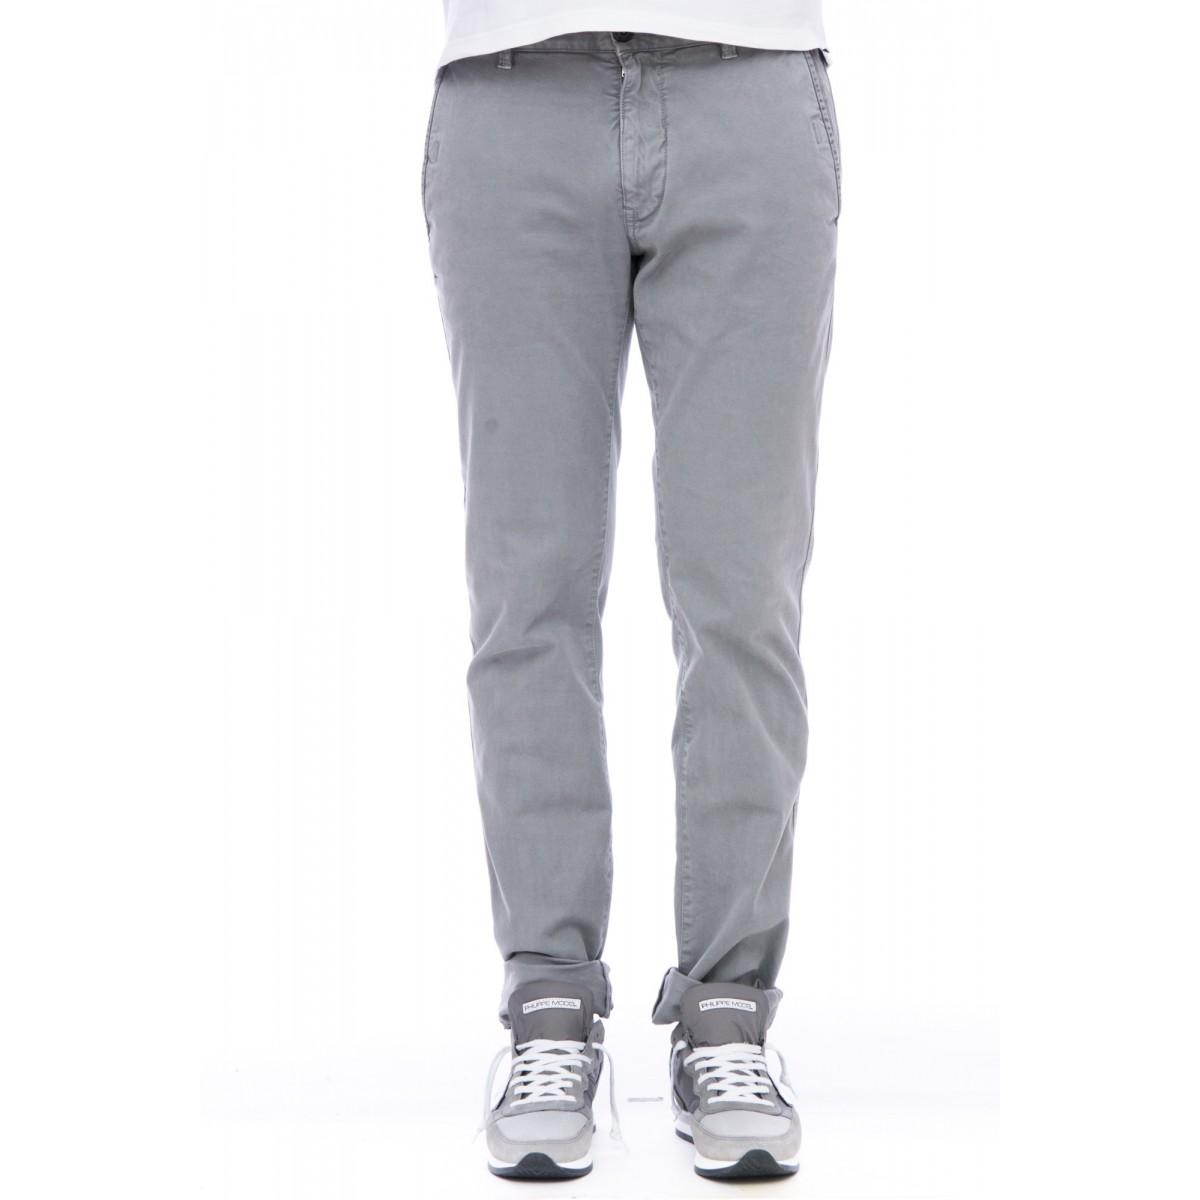 Pantalone uomo Stone island - 302ln pantalone slim